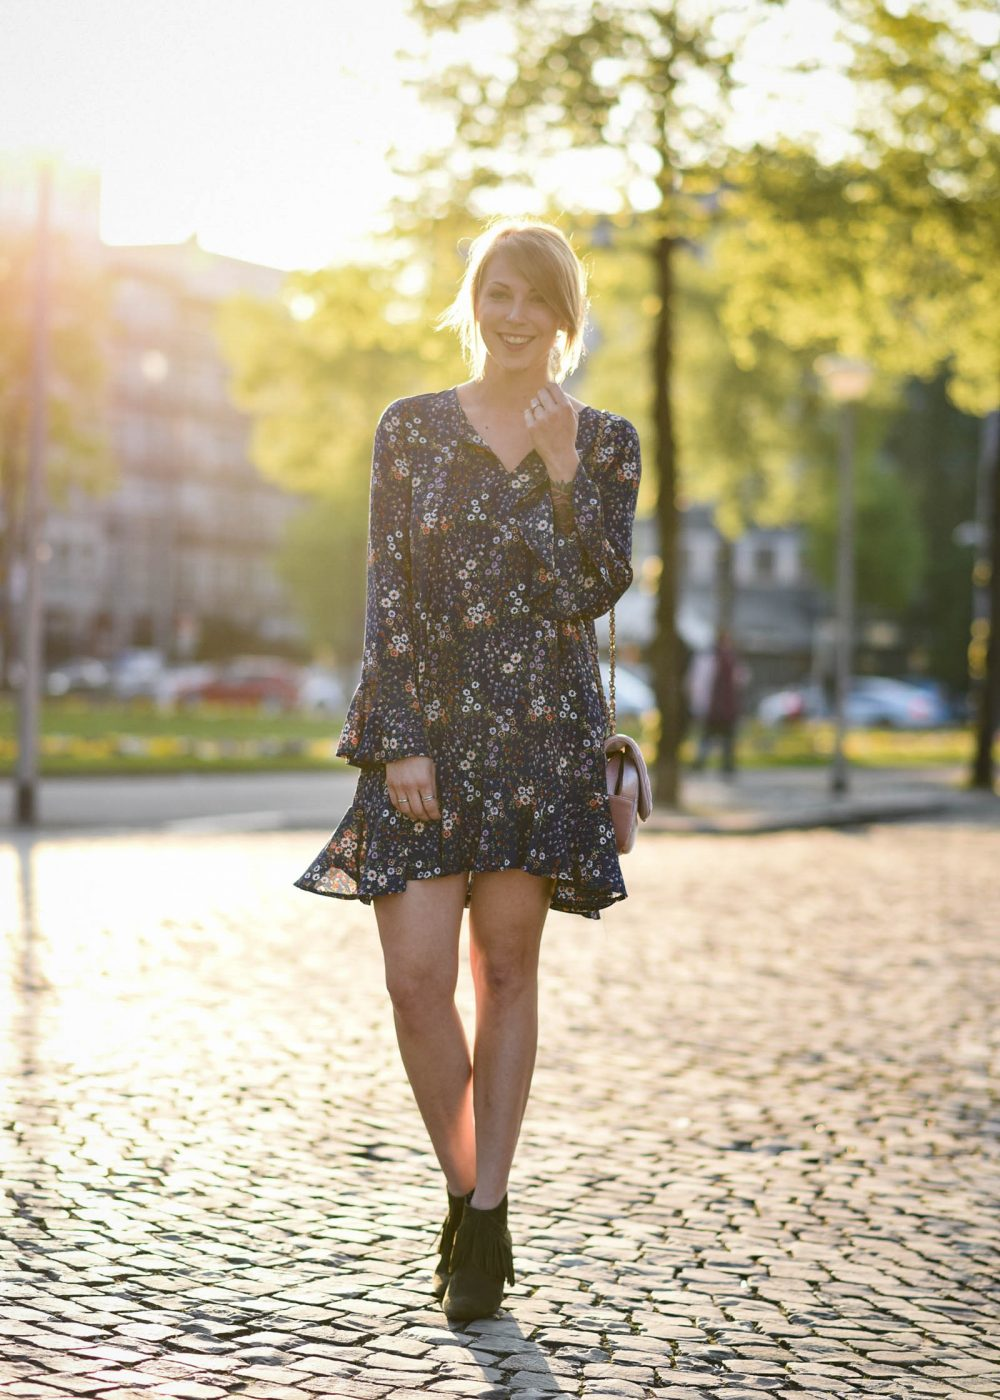 outfit: frühlingsgefühle - blaues kleid mit blumenprint